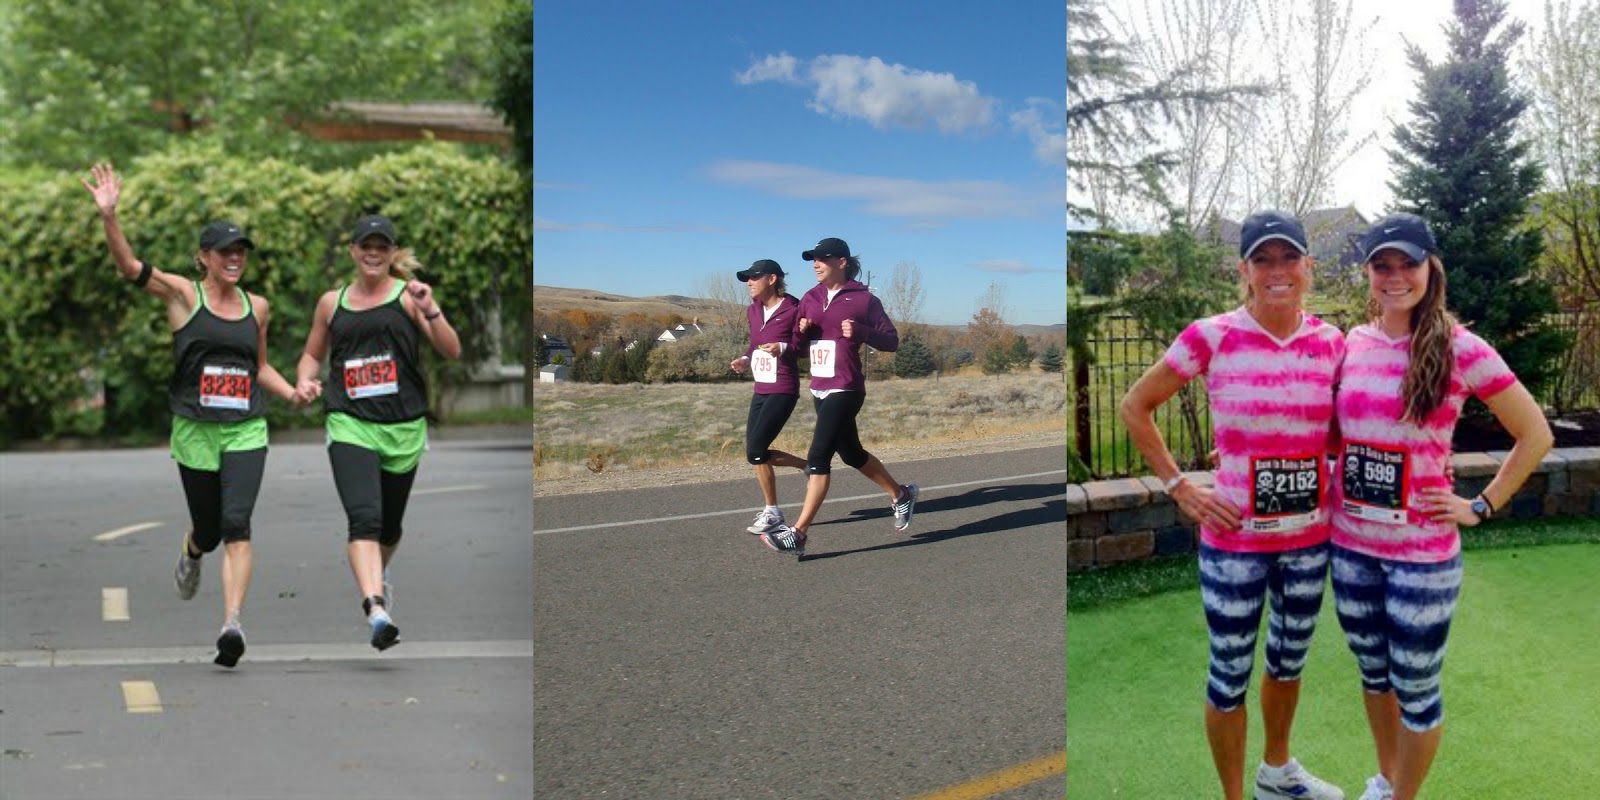 half marathon matching outfits